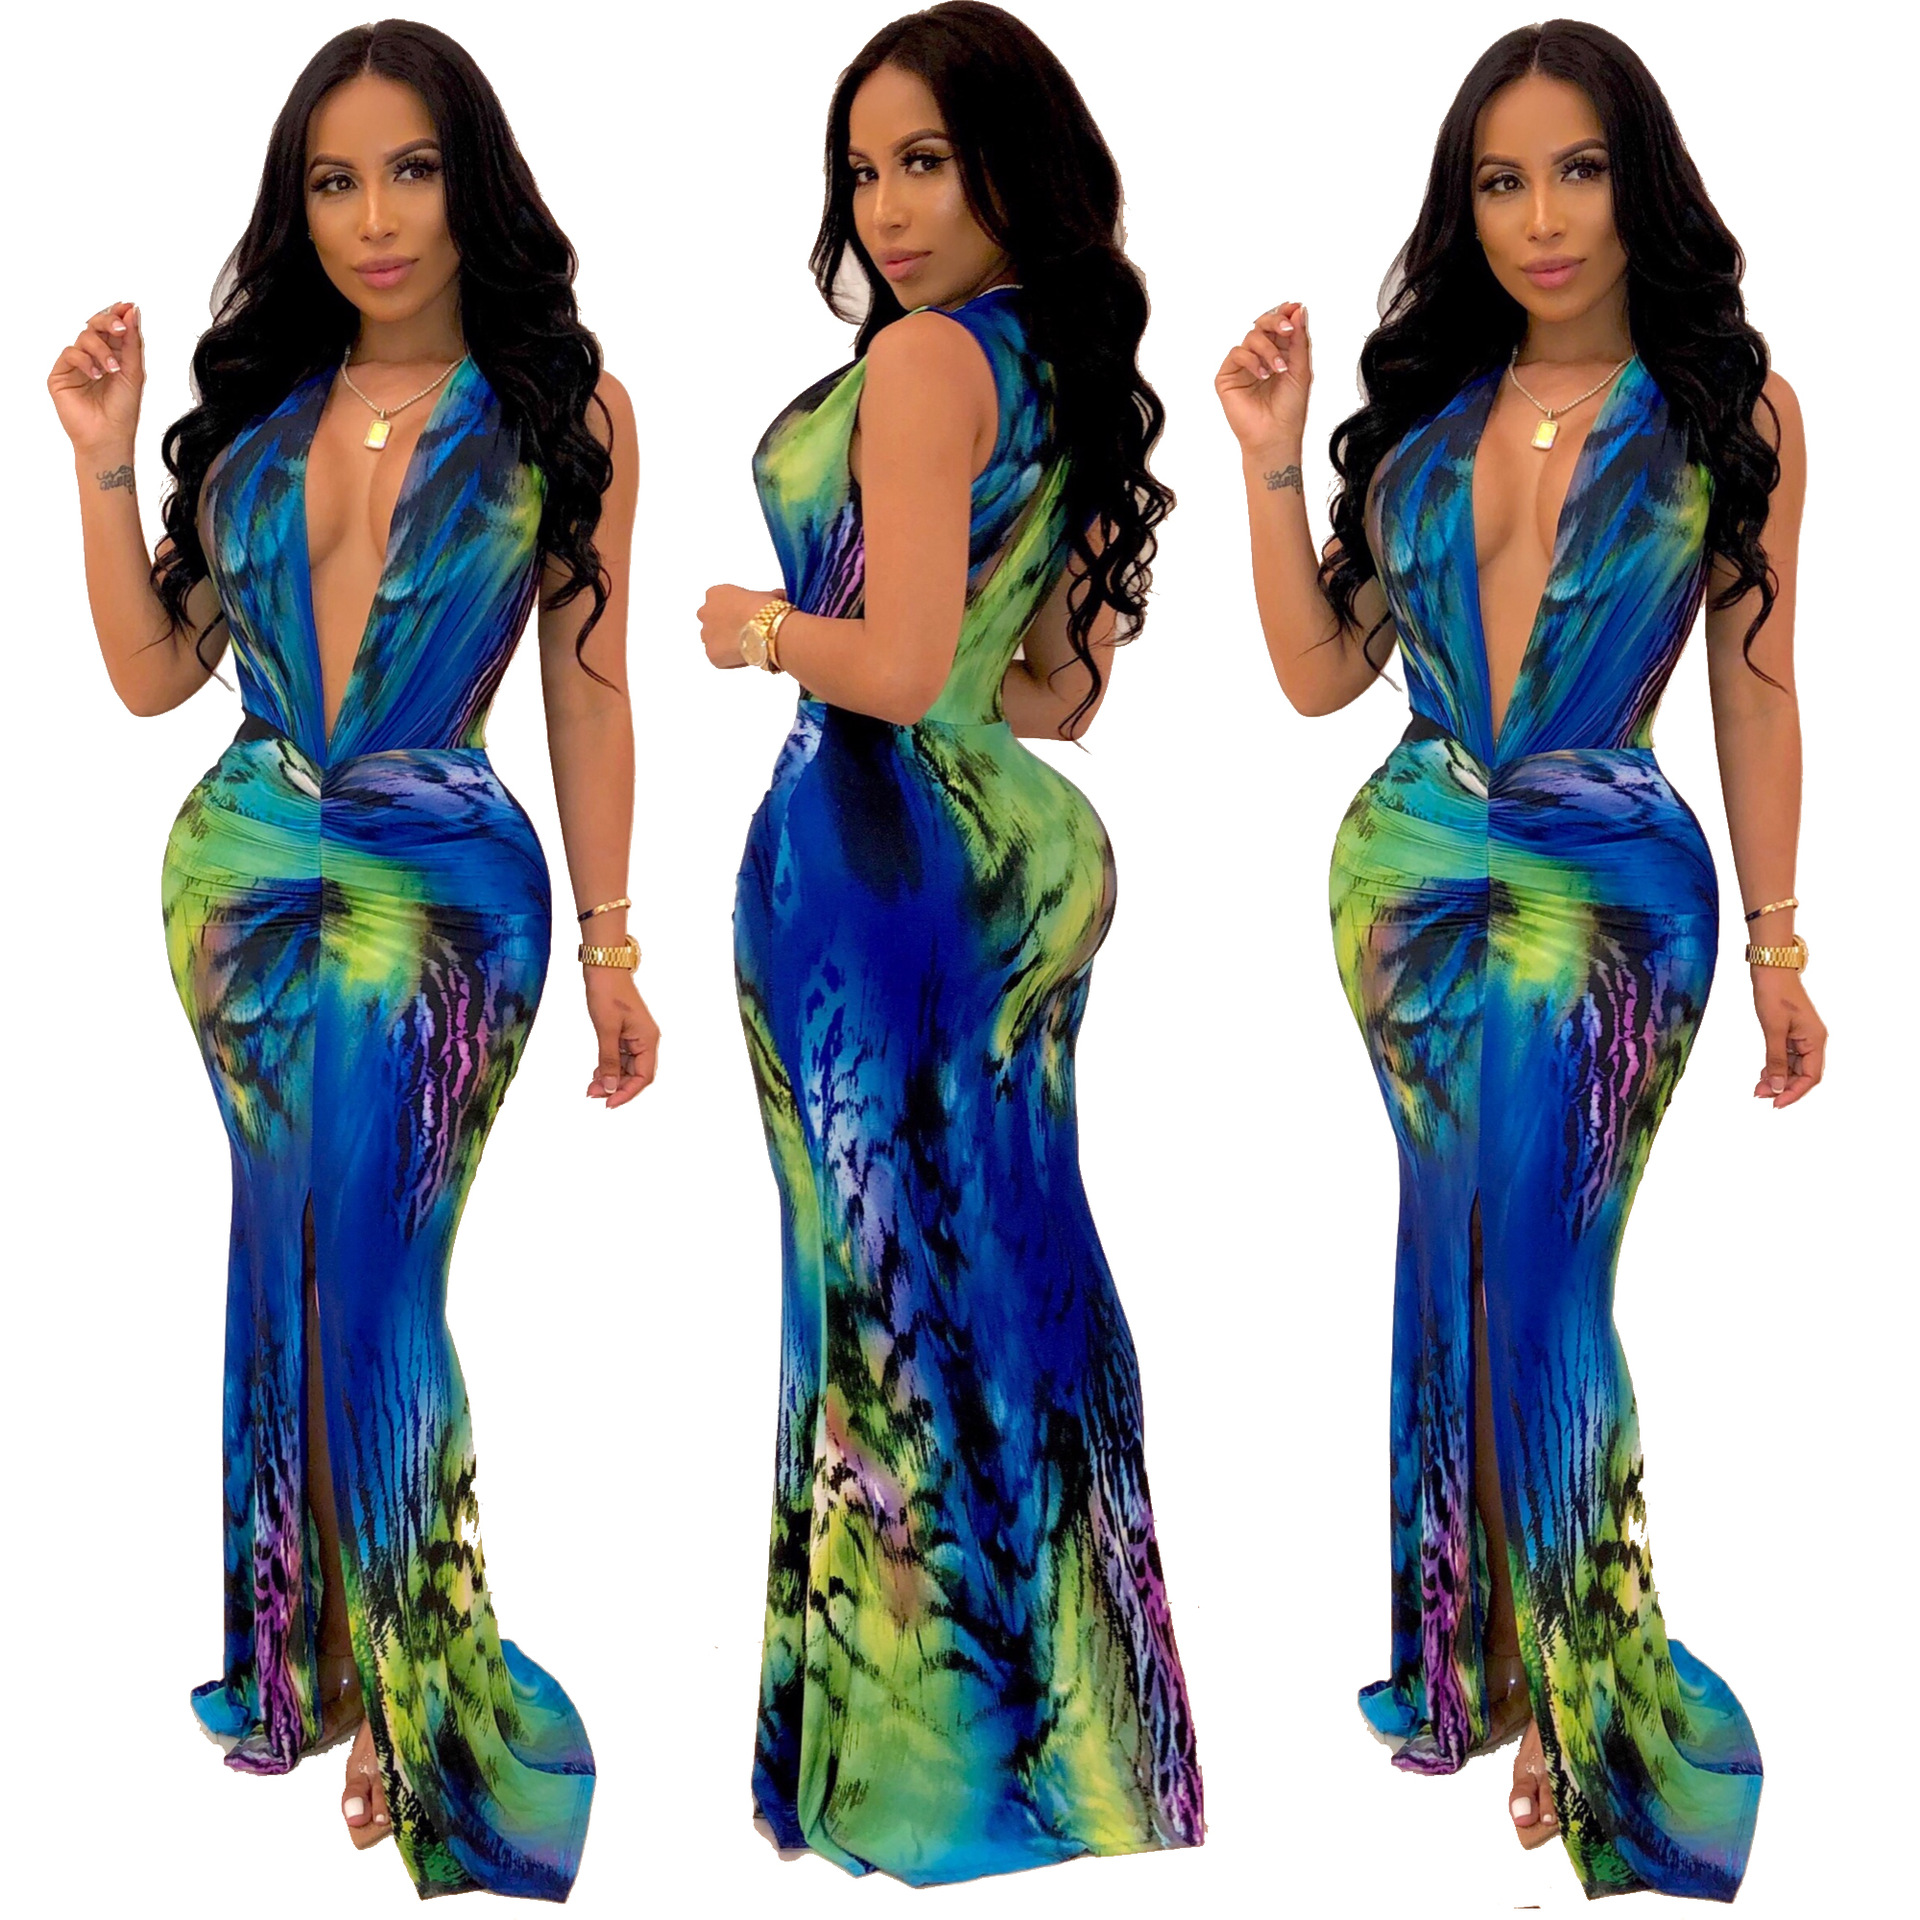 Summer Sexy Deep V Nck Printed Long Dress Women Sleeveless Empire Graceful Robes Fashion Party Trumpet Maxi Dress LZ579